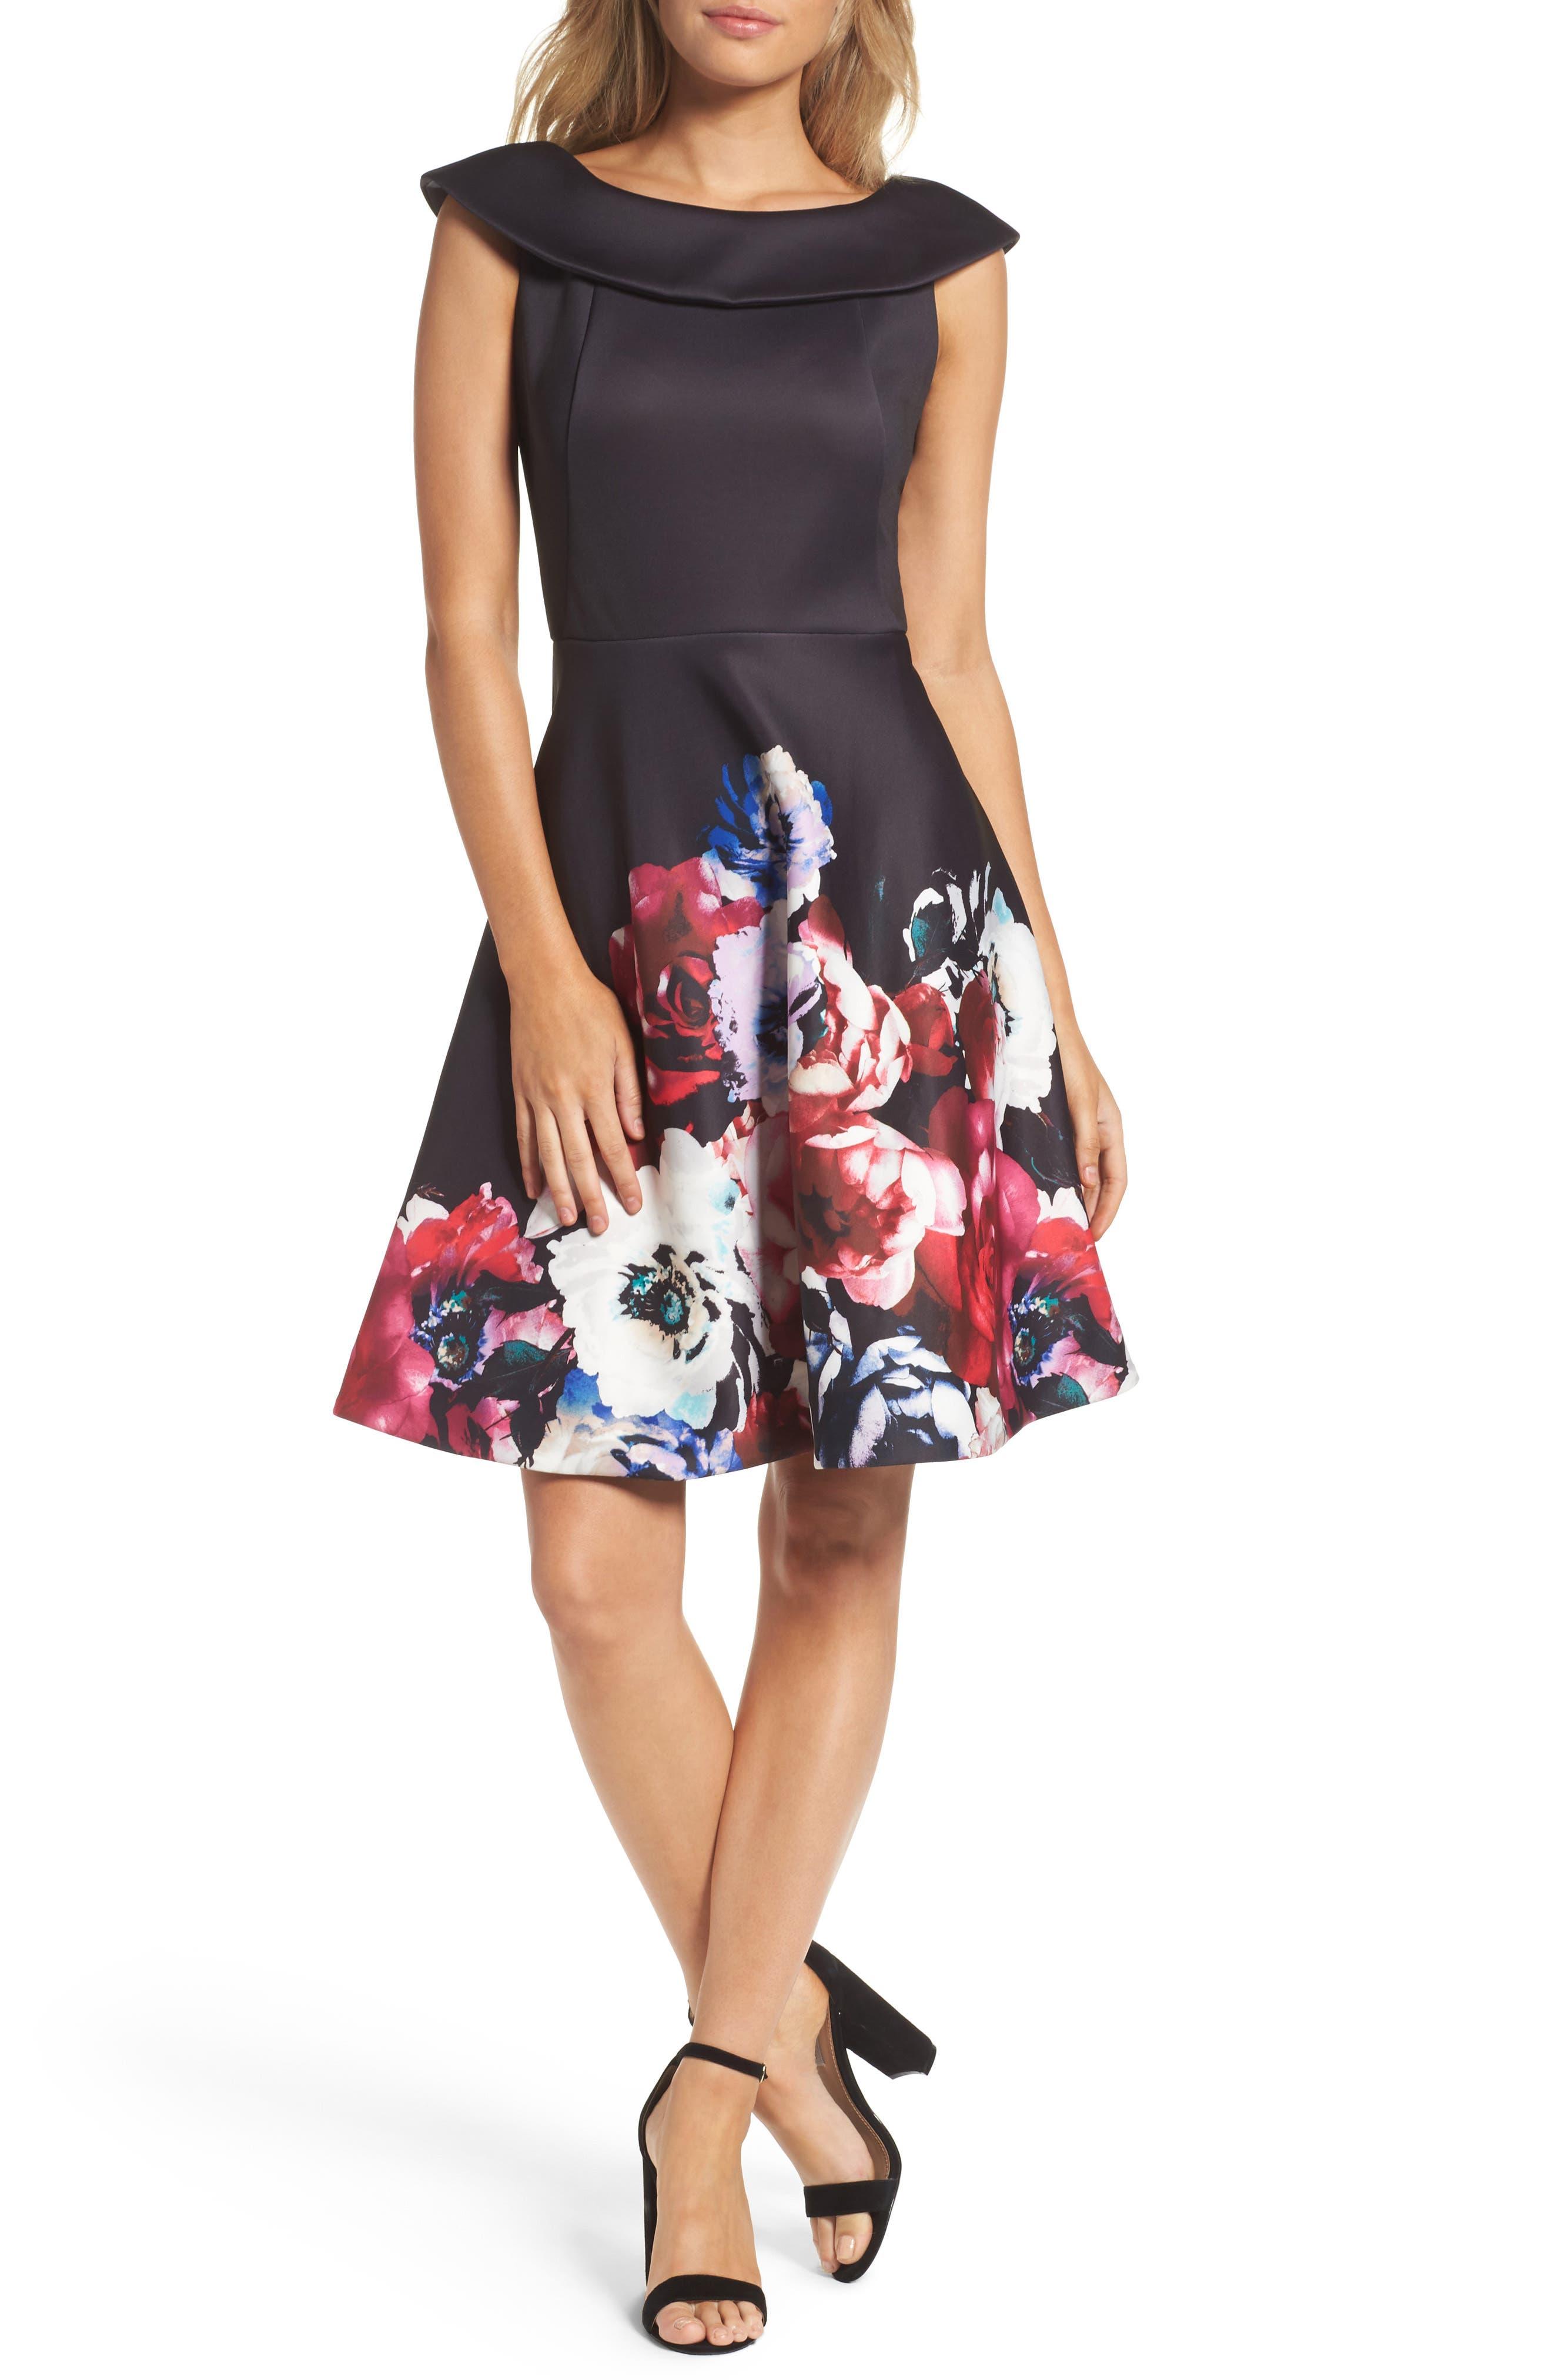 Taylor Dresses Scuba Knit Fit & Flare Dress